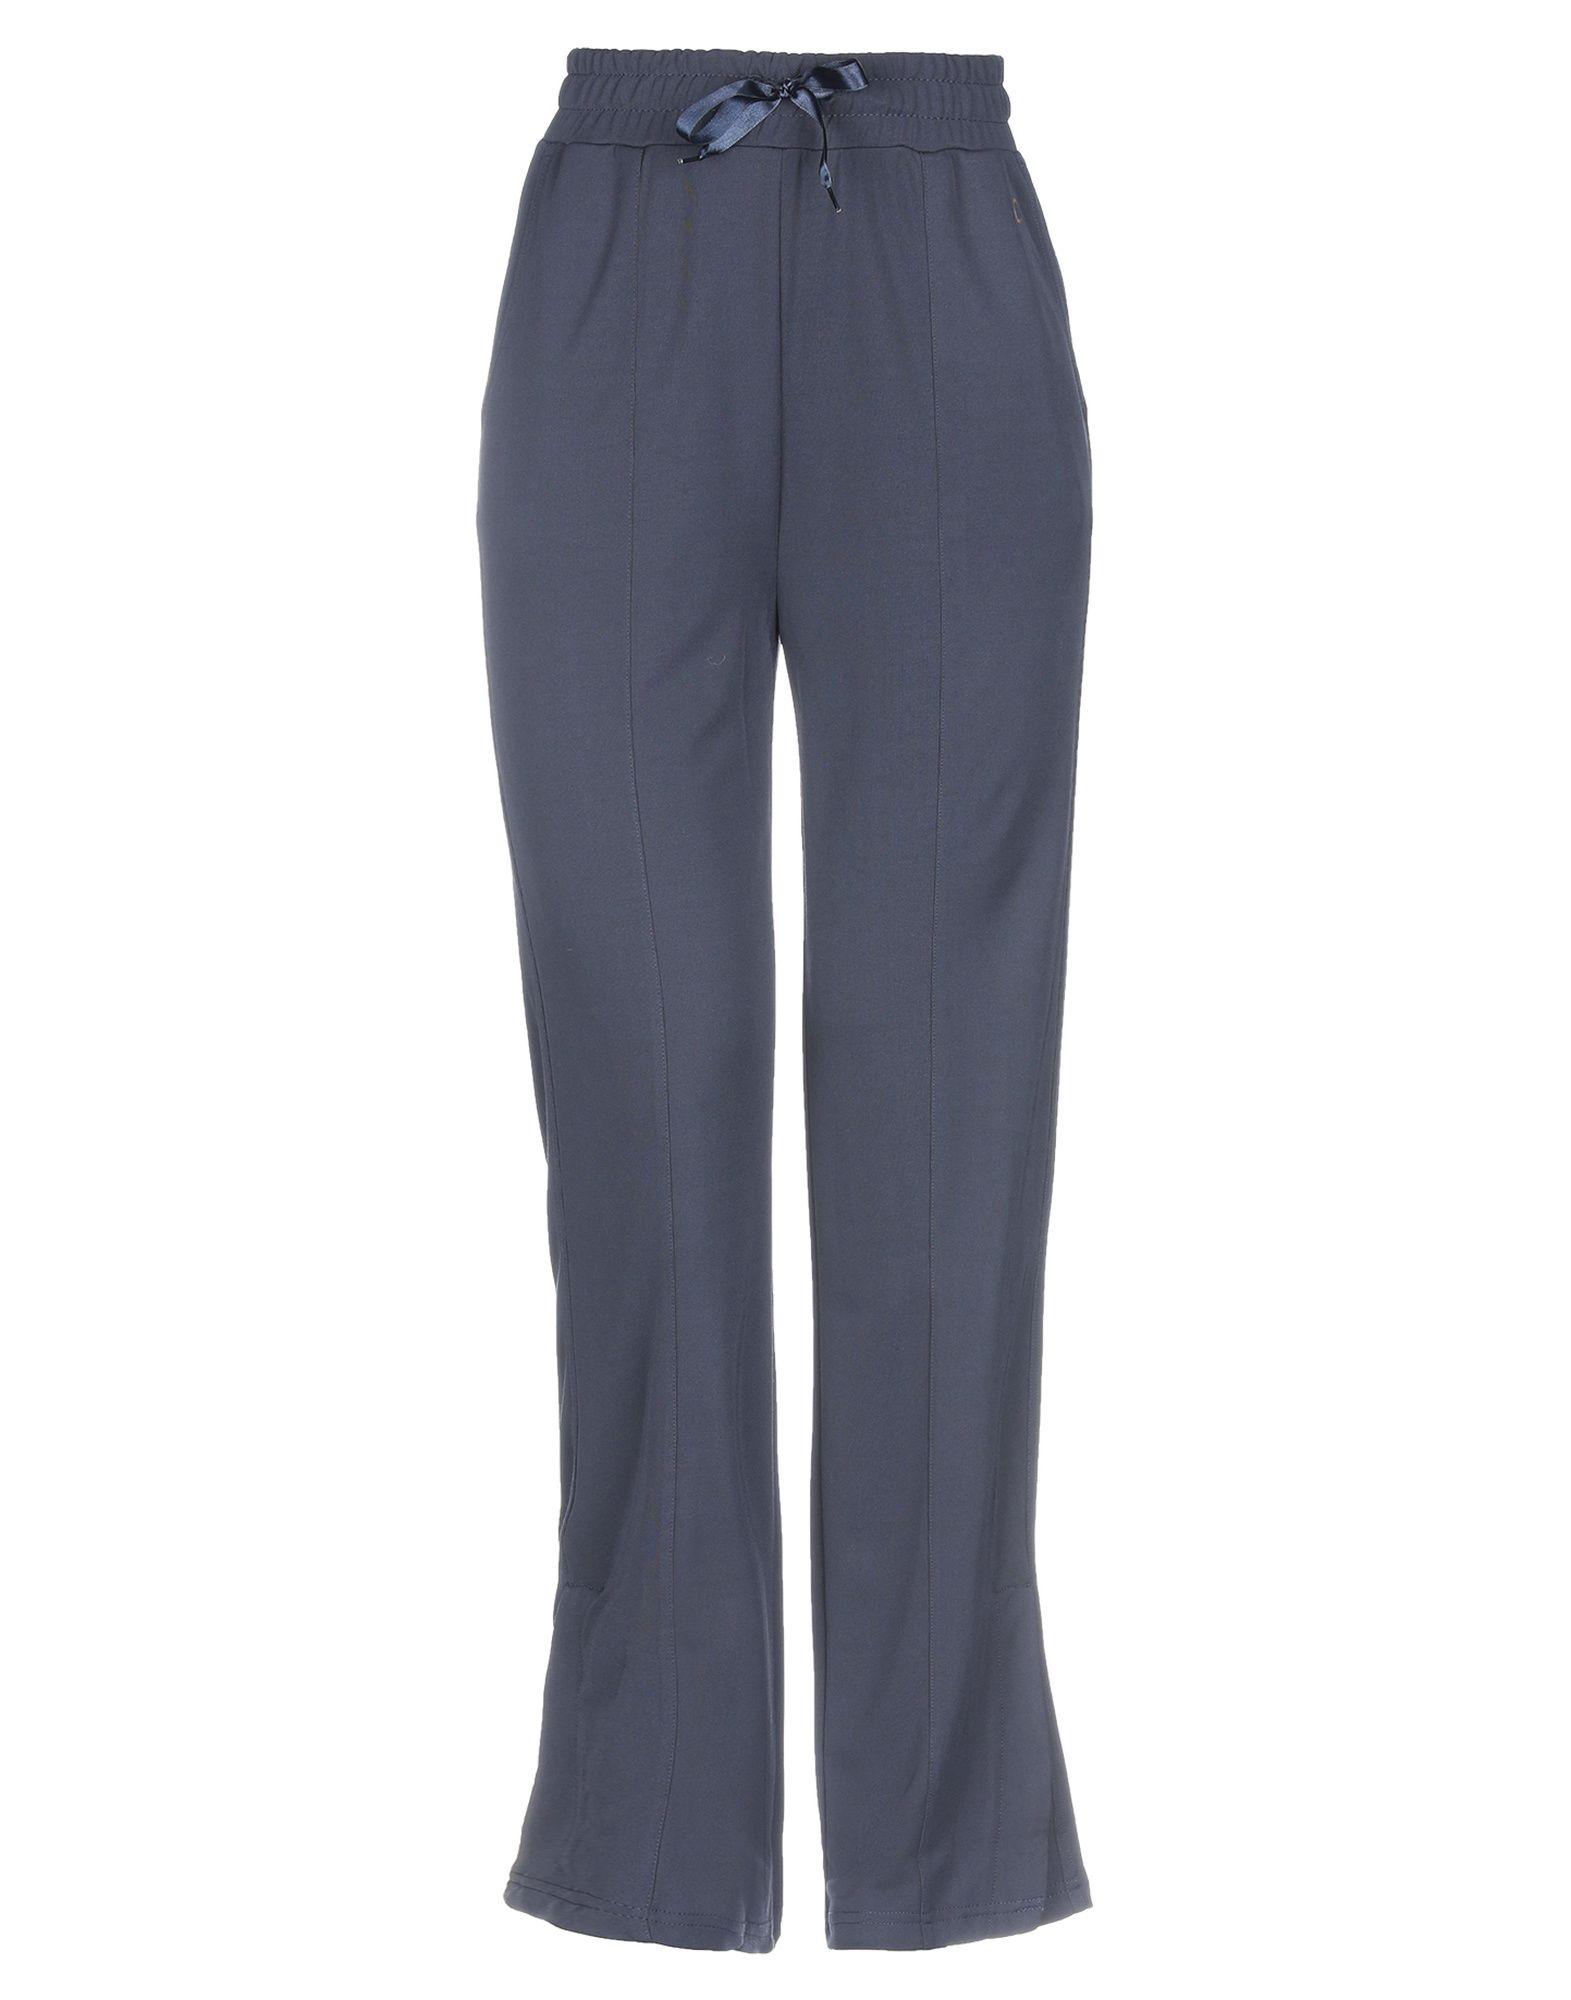 цена на DROP OF MINDFULNESS Повседневные брюки